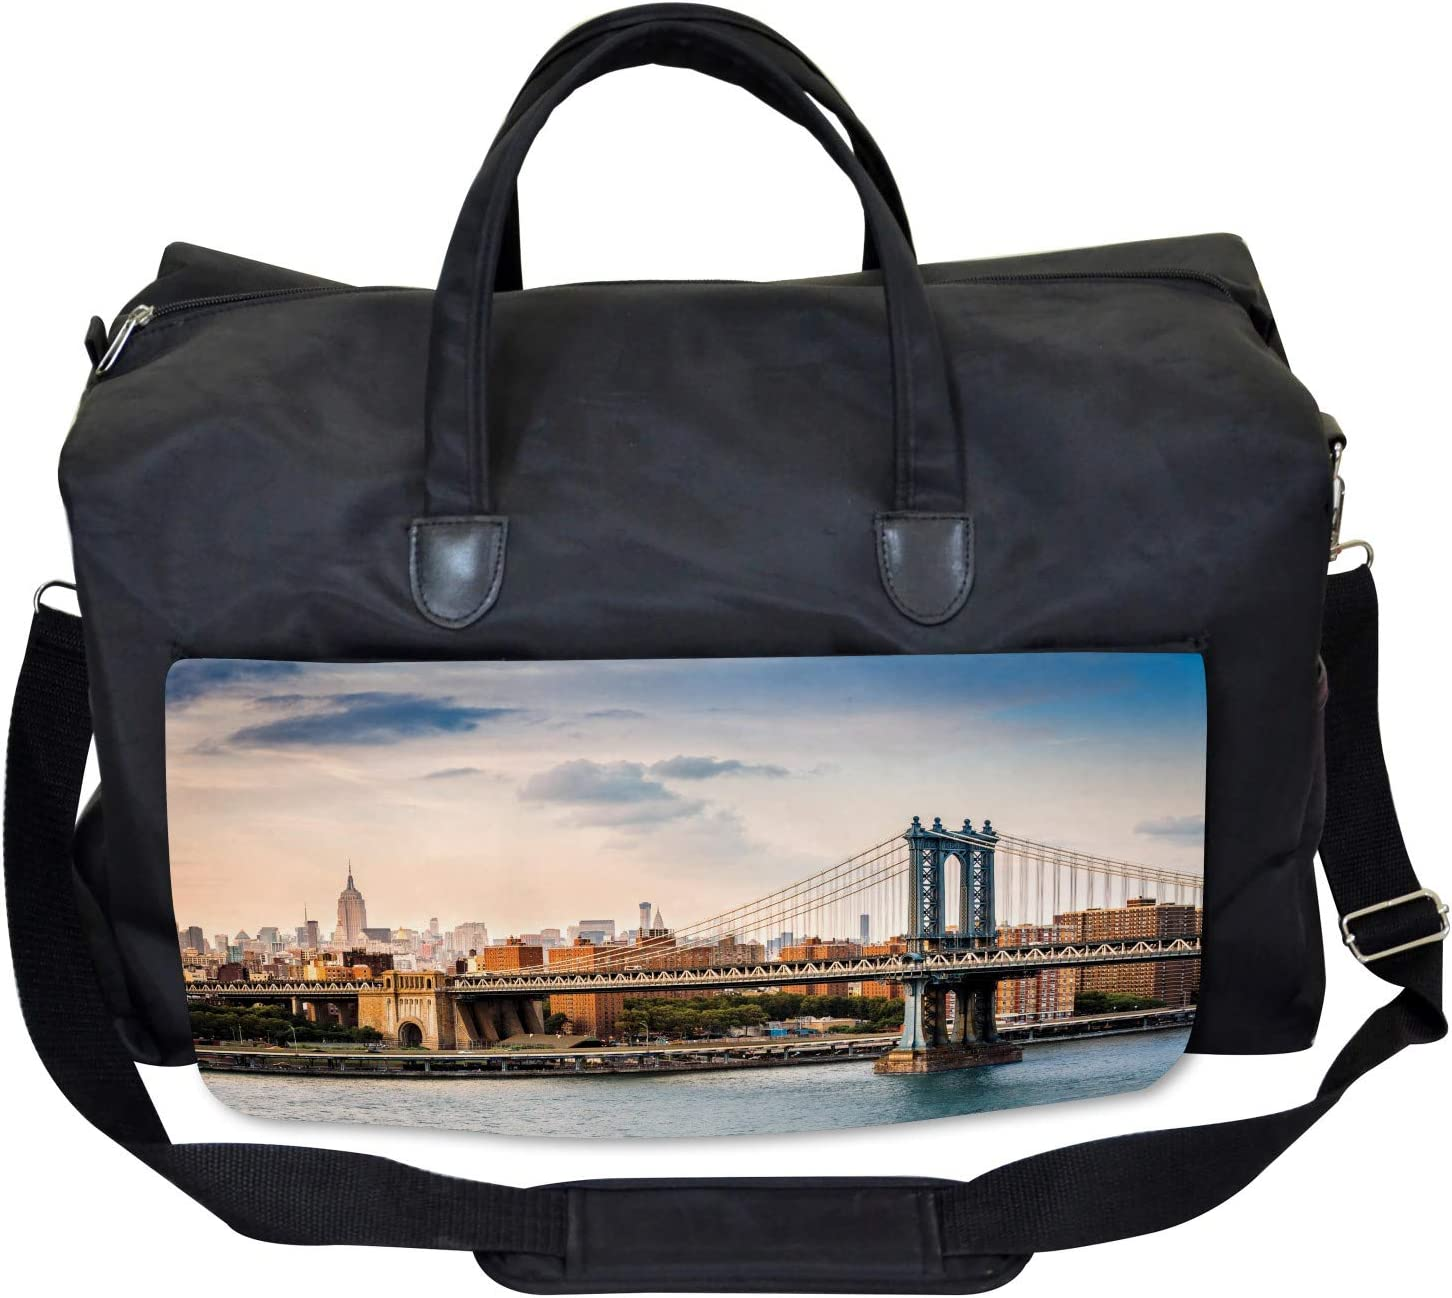 Manhattan Bridge in NYC Large Weekender Carry-on Ambesonne USA Gym Bag